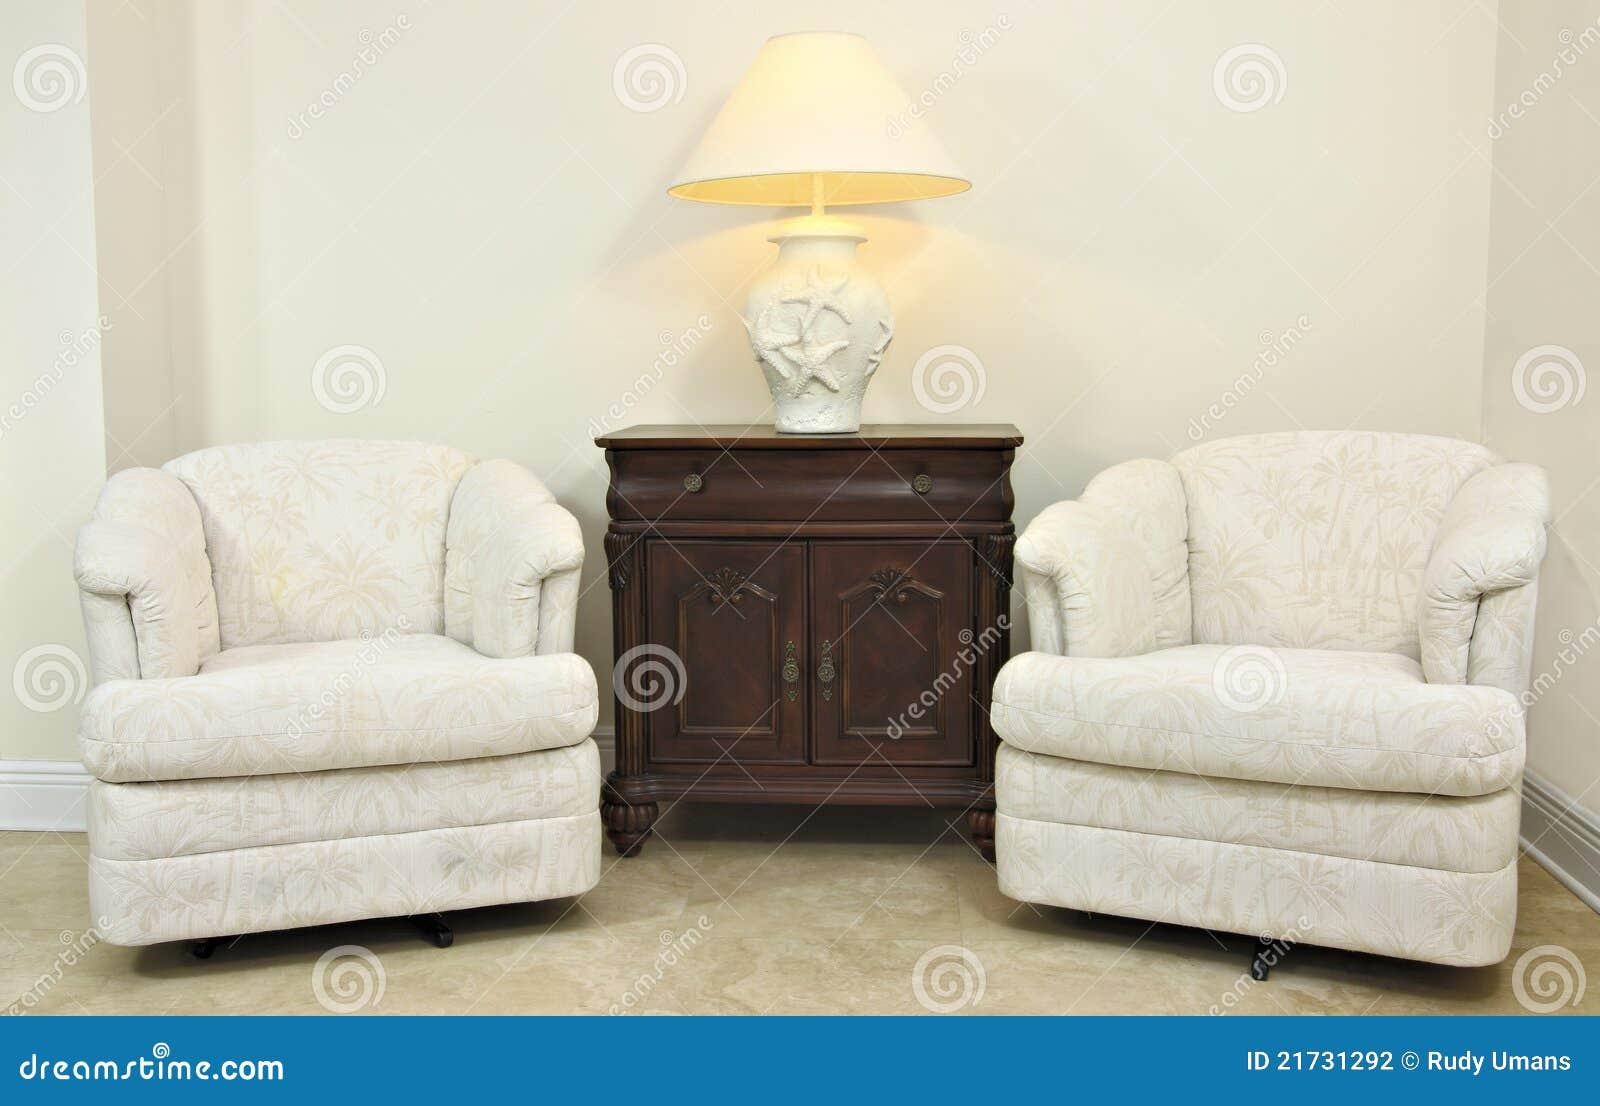 Sitting Nook Stock Photography - Image: 21731292